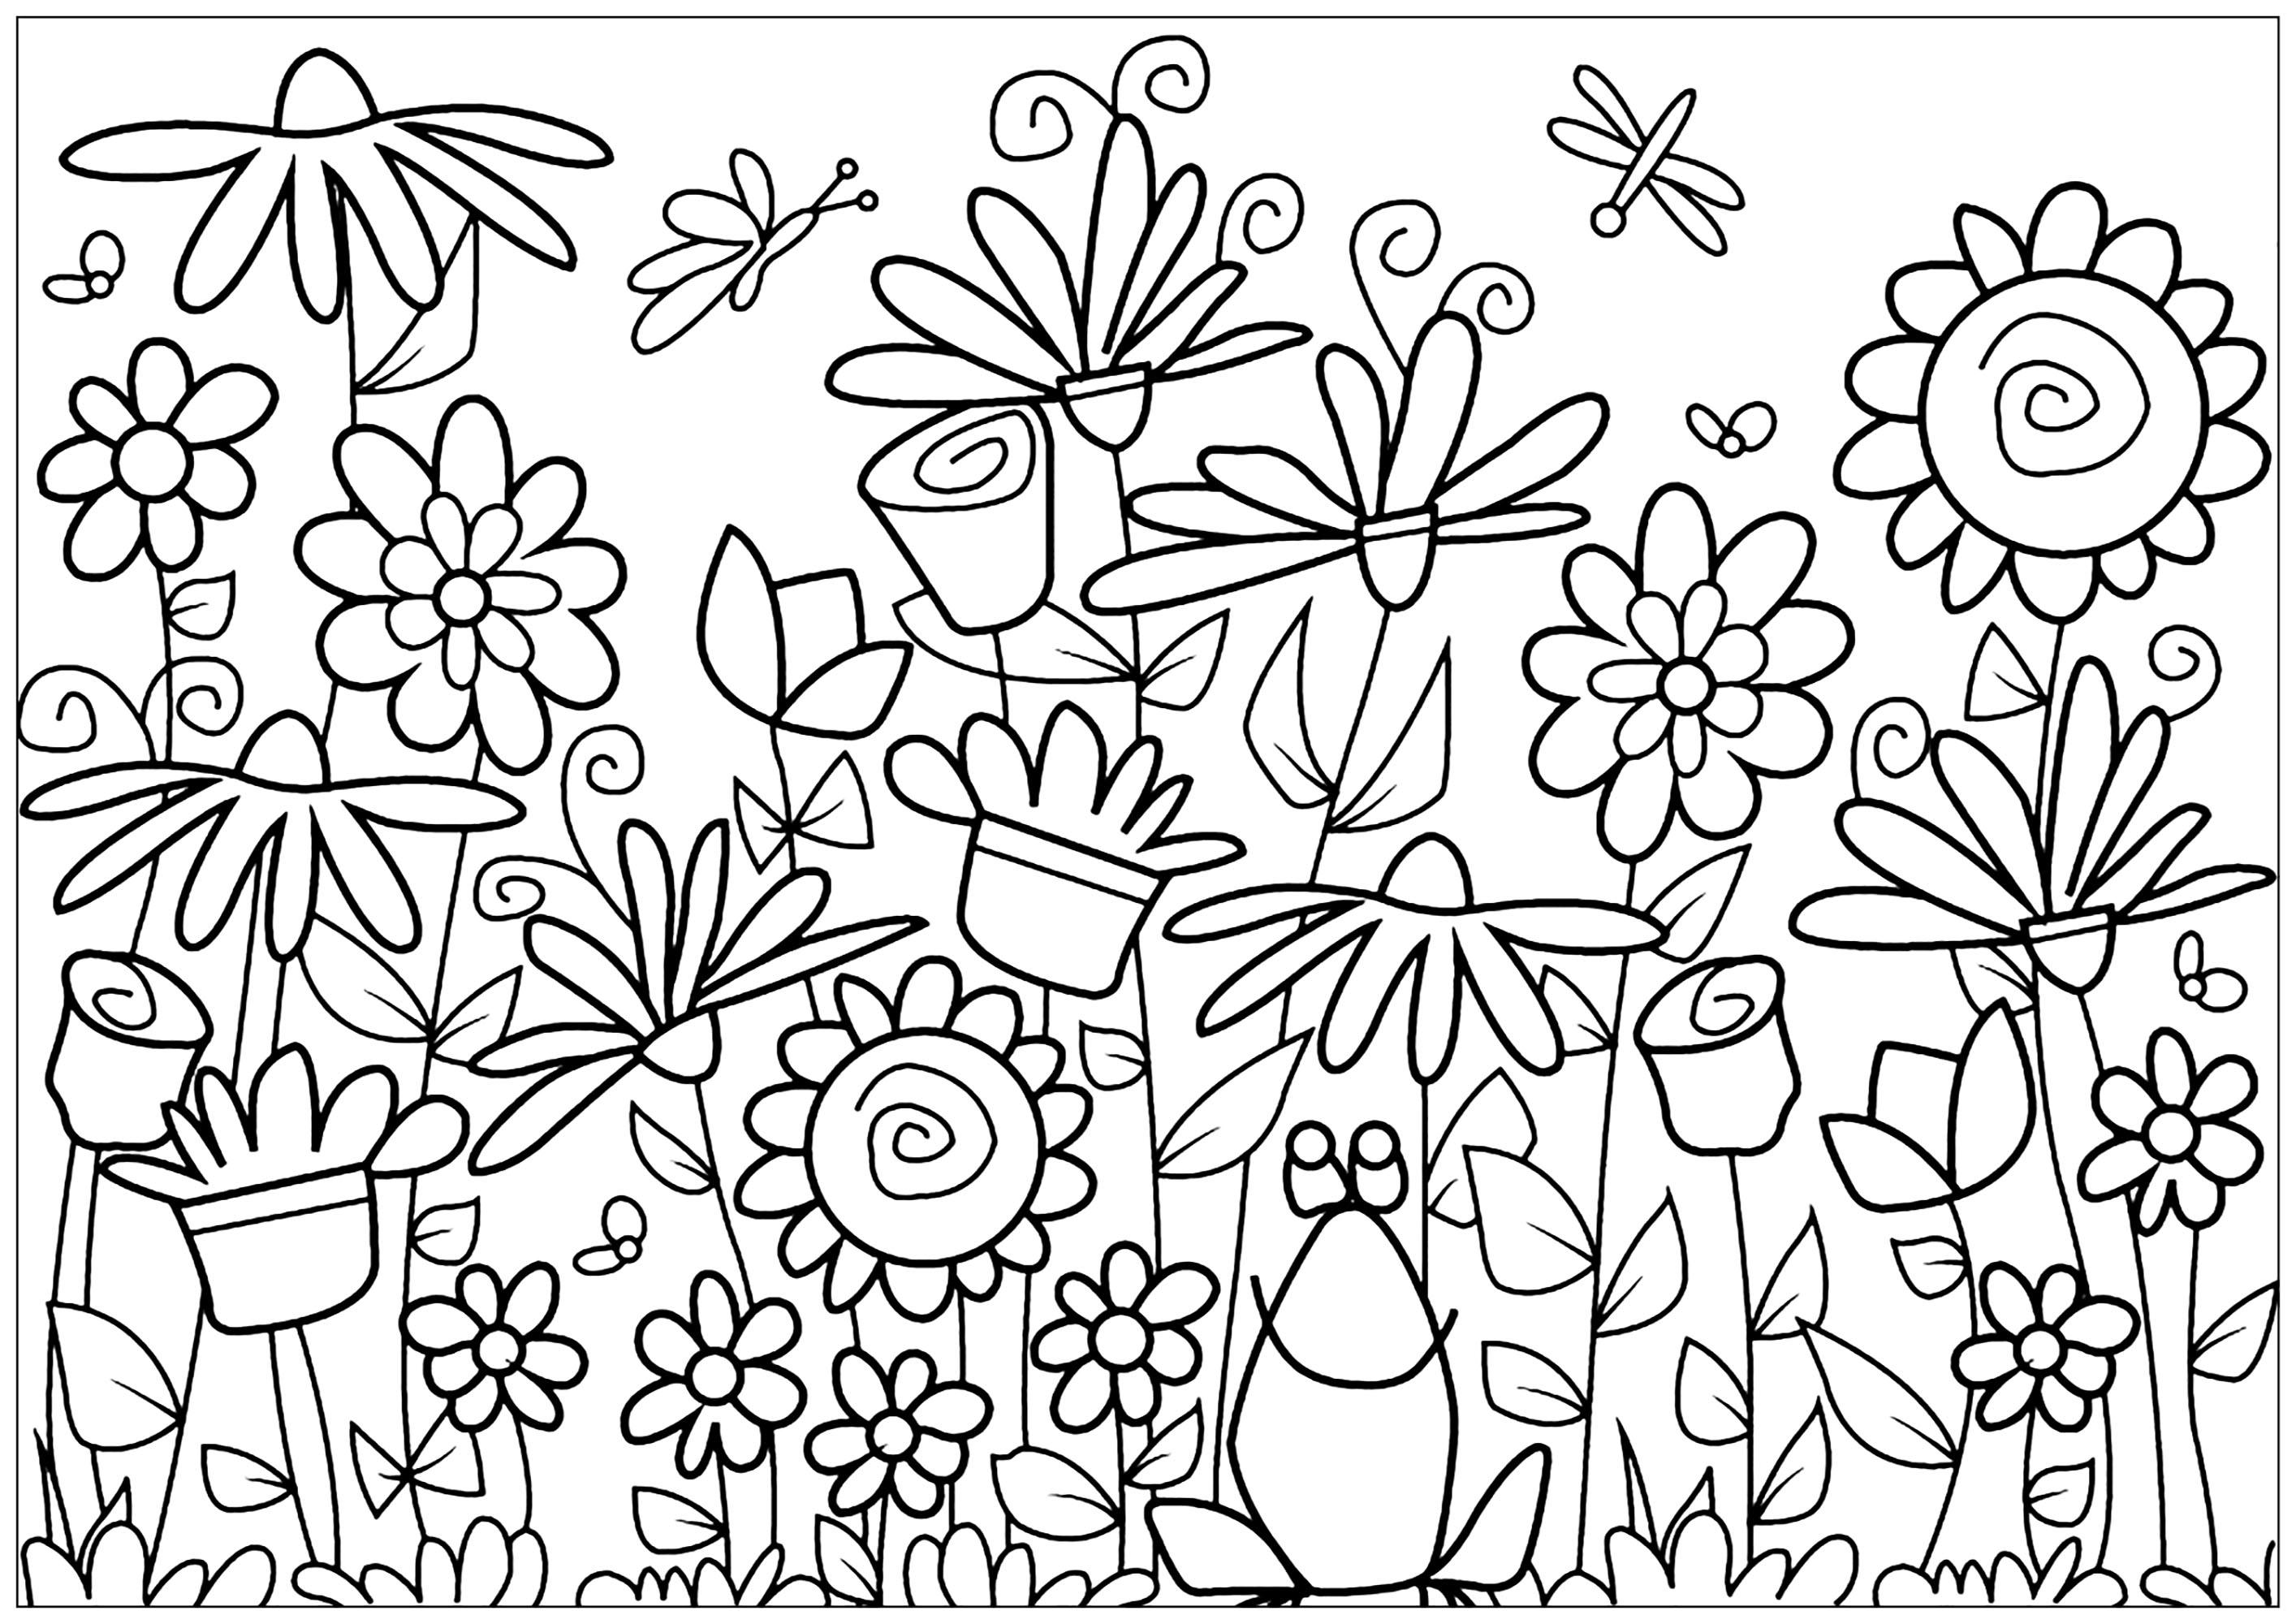 Blumen vegetation 34391